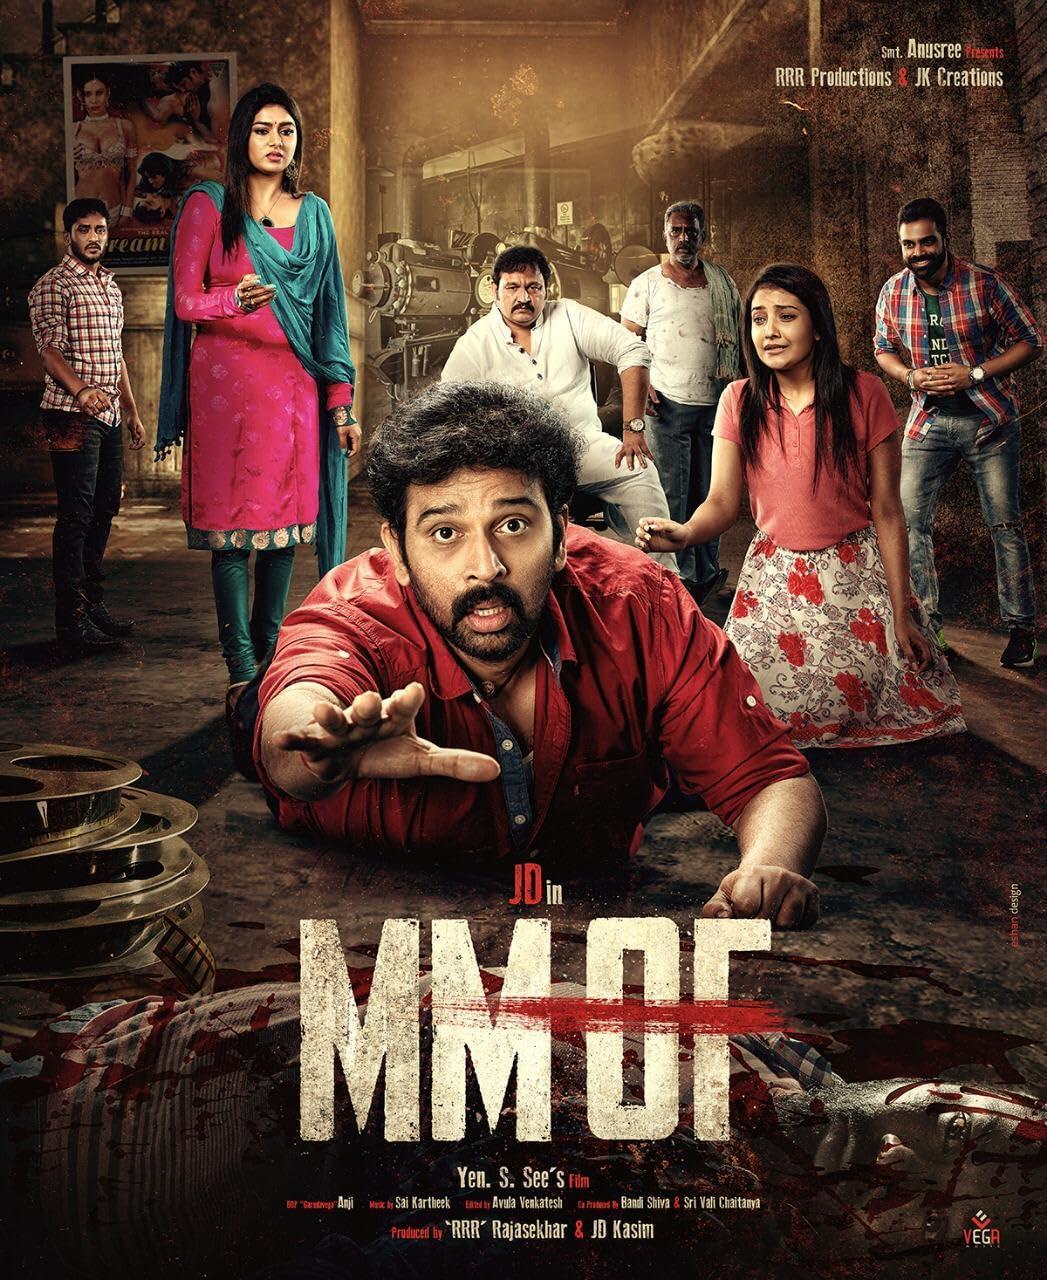 MMOF (2021) Hindi Dubbed